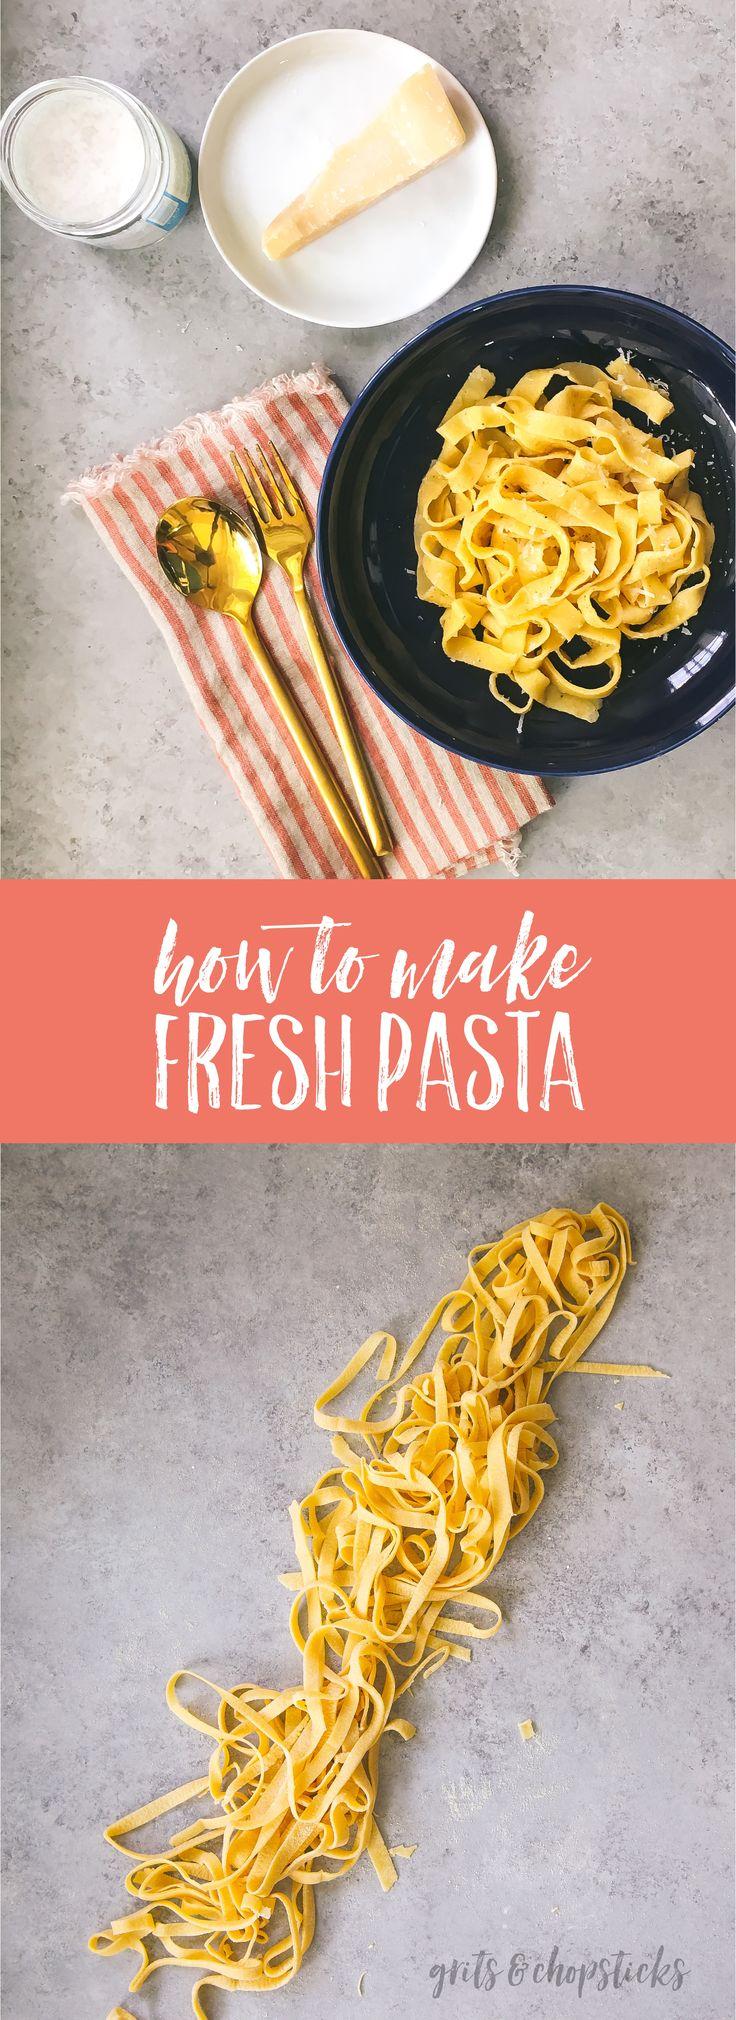 making fresh pasta without a machine